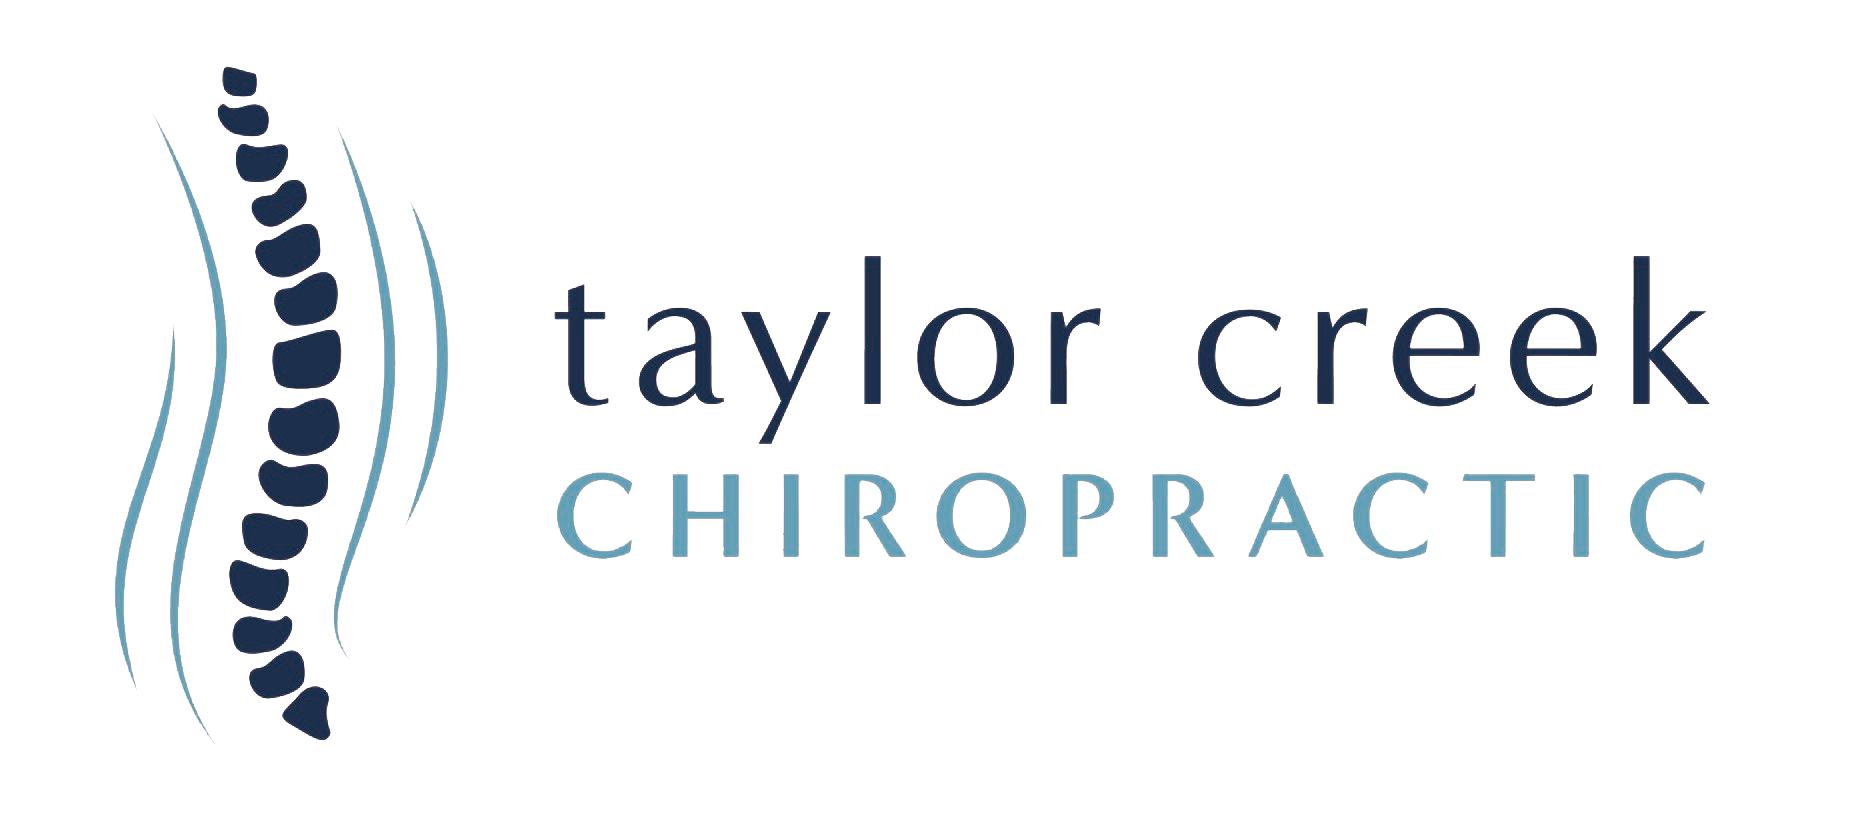 Taylor Creek Chiropractic